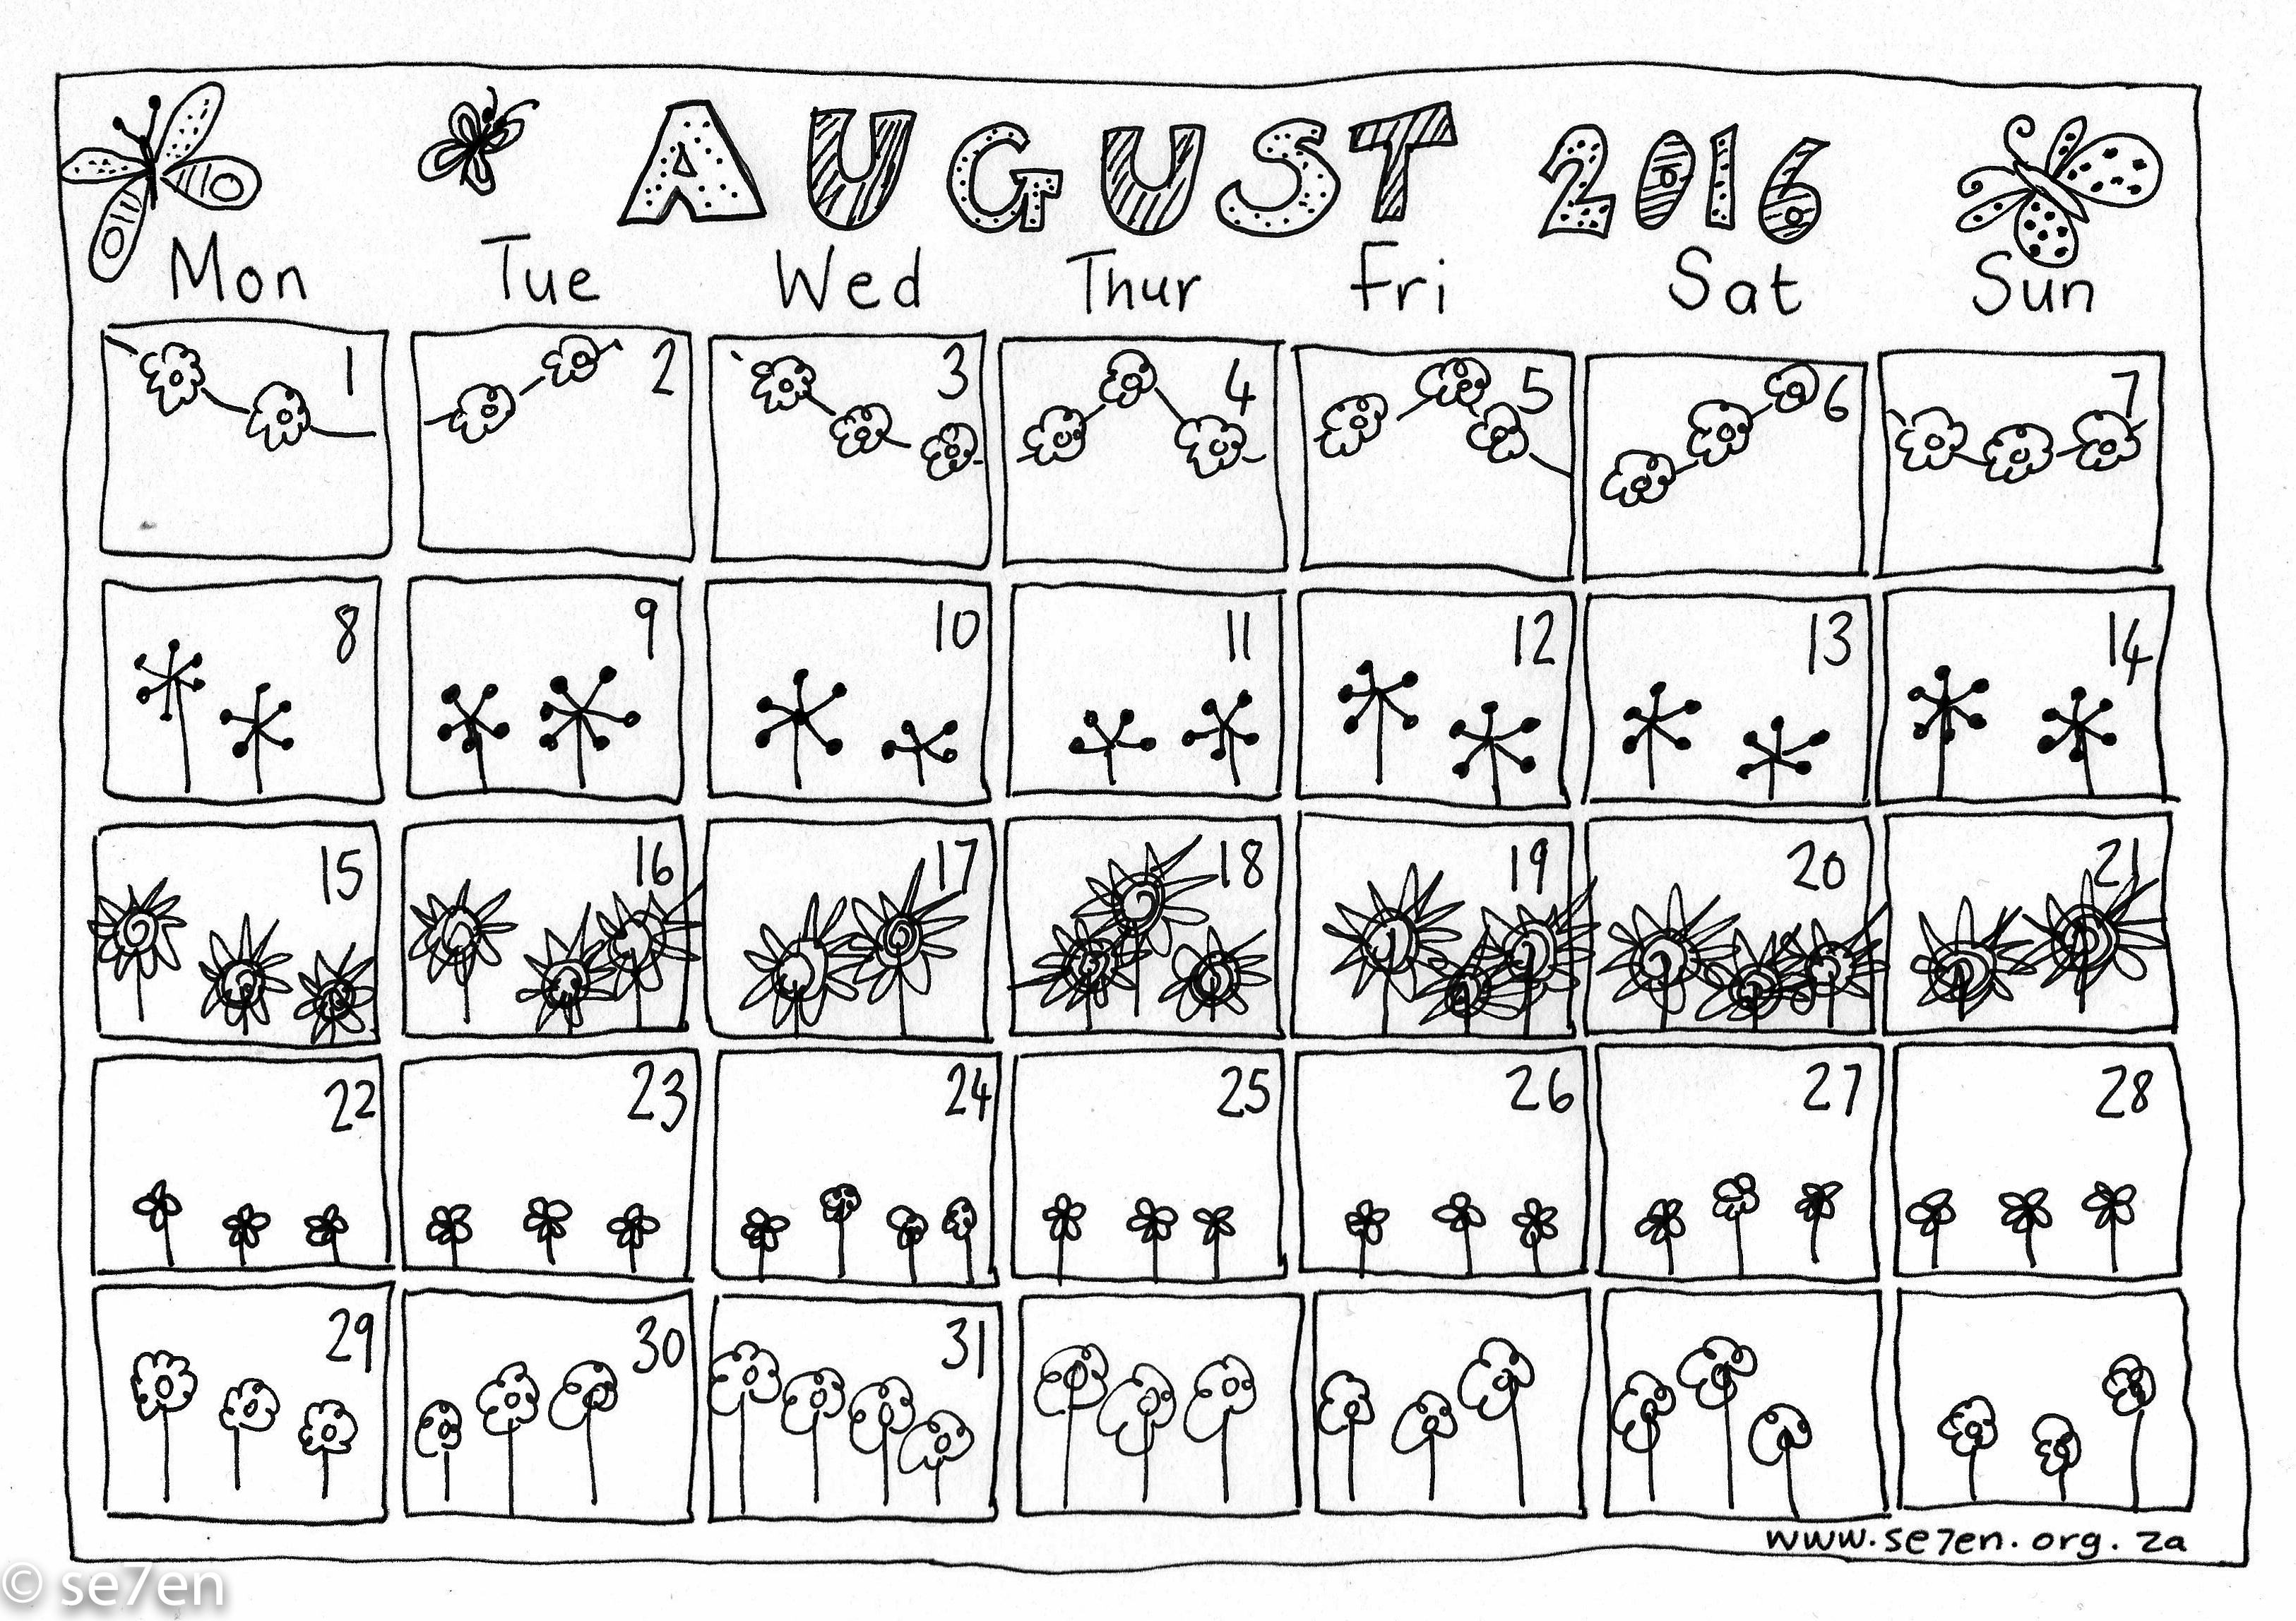 se7en-03-Aug-16-August 2016-1.jpg